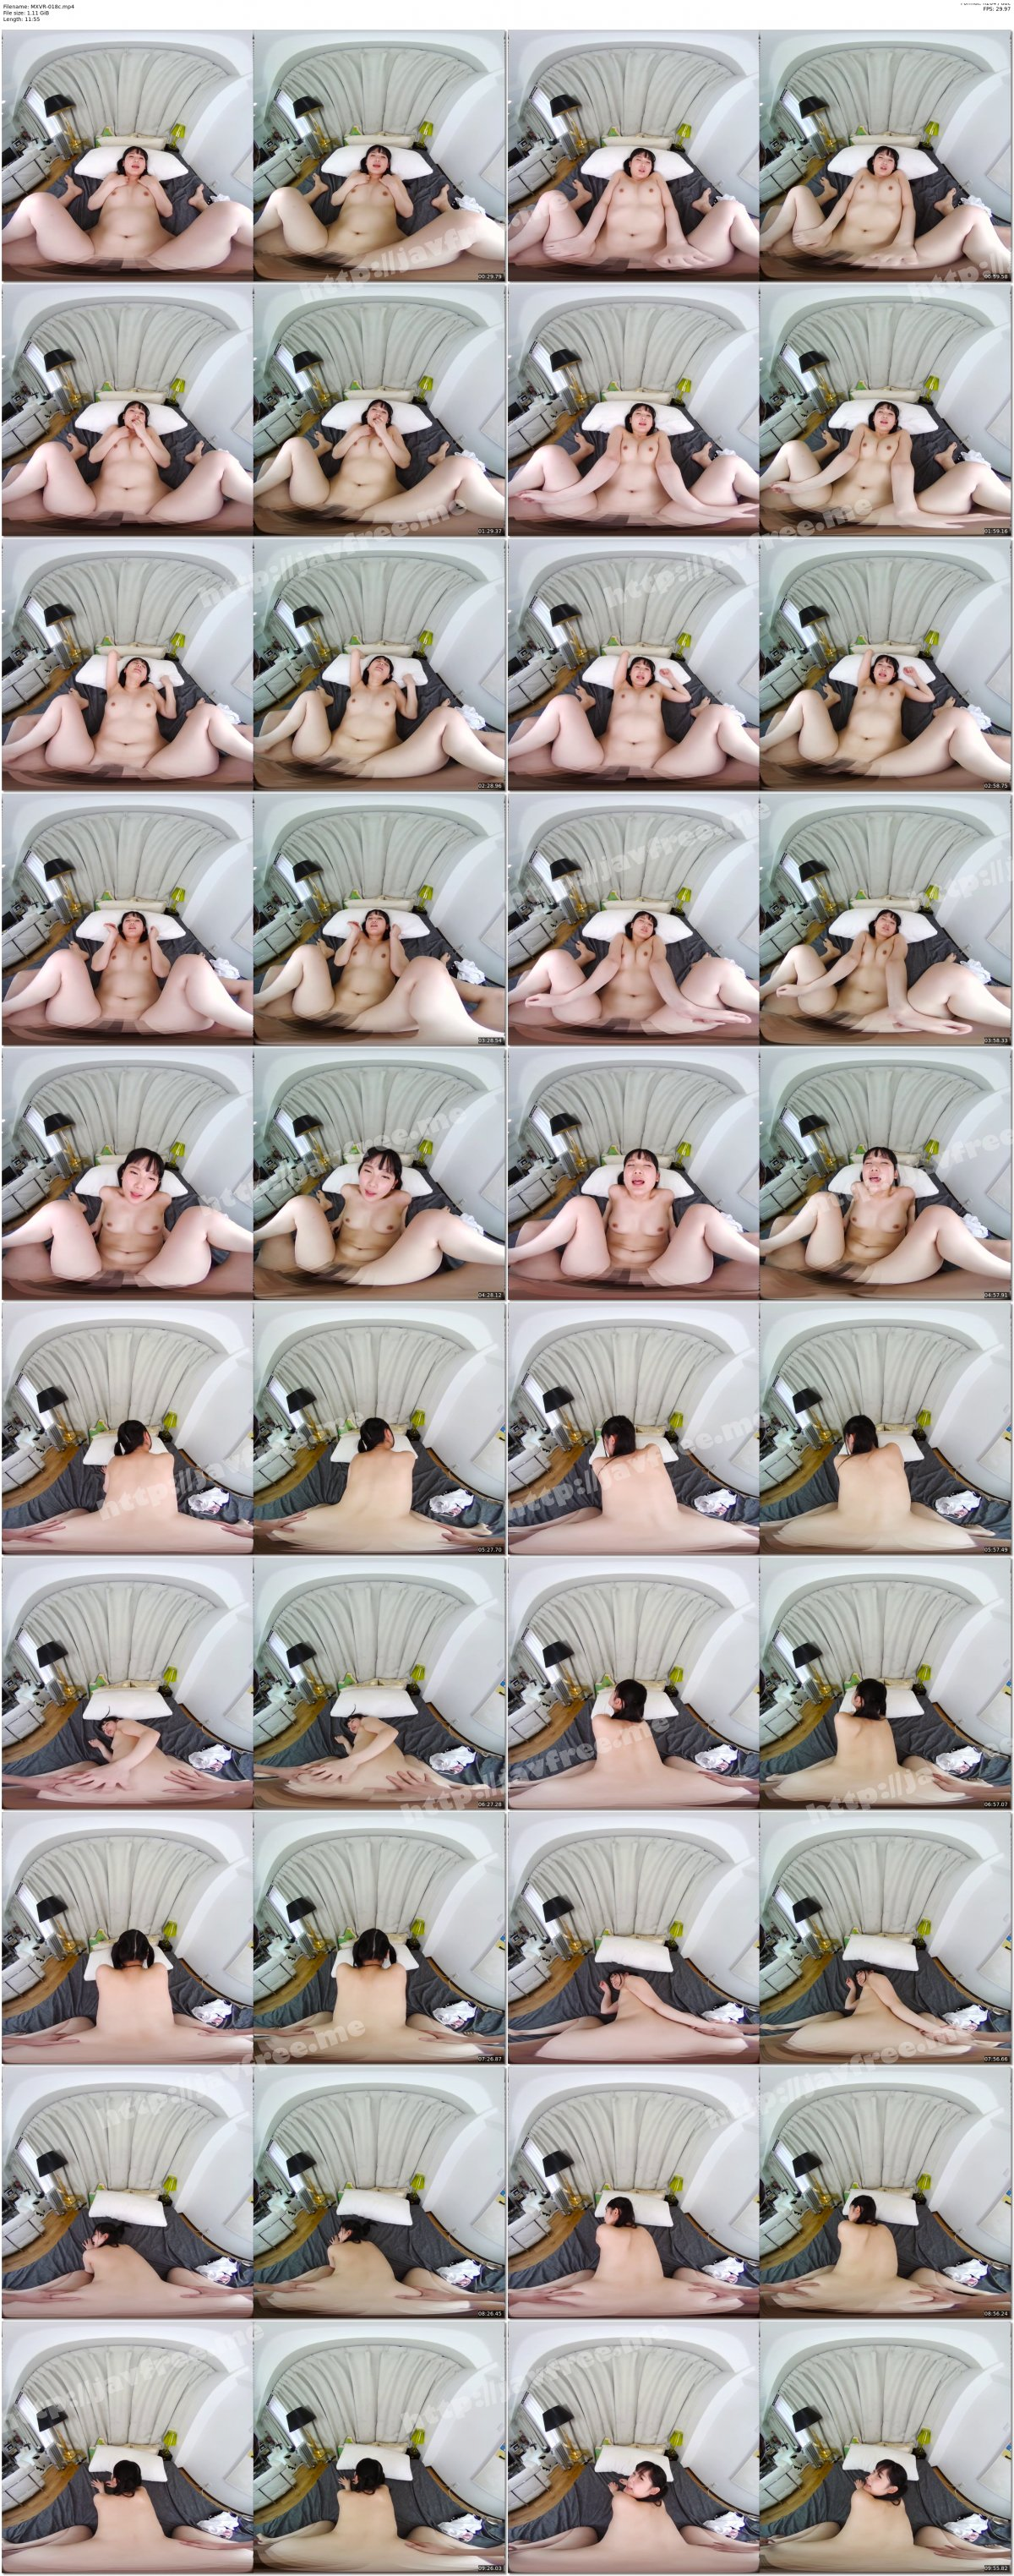 [MXVR-018] 【VR】お尻がキュートな彼女とイチャイチャ生活。爆尻をもみしだく&あやとイチャイチャ2本立て 【宮崎あや】 - image MXVR-018c on https://javfree.me